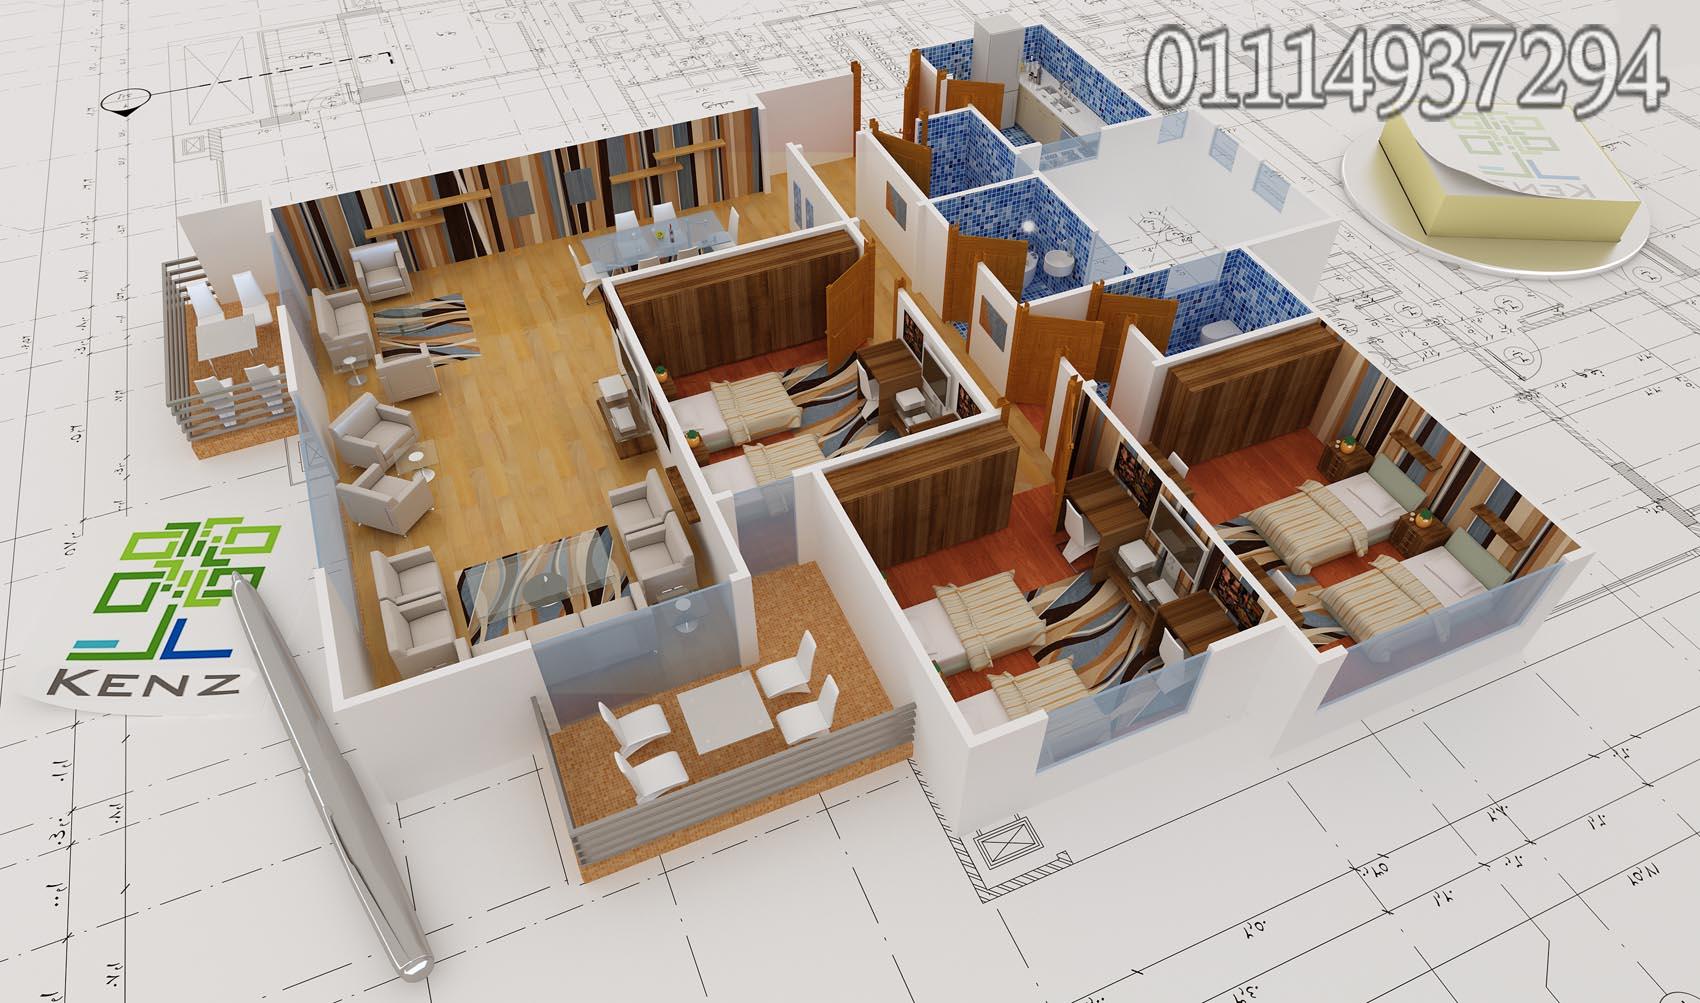 شقة 184 متر دور علوى متكرر كمبوند كنز حدائق 6 اكتوبر